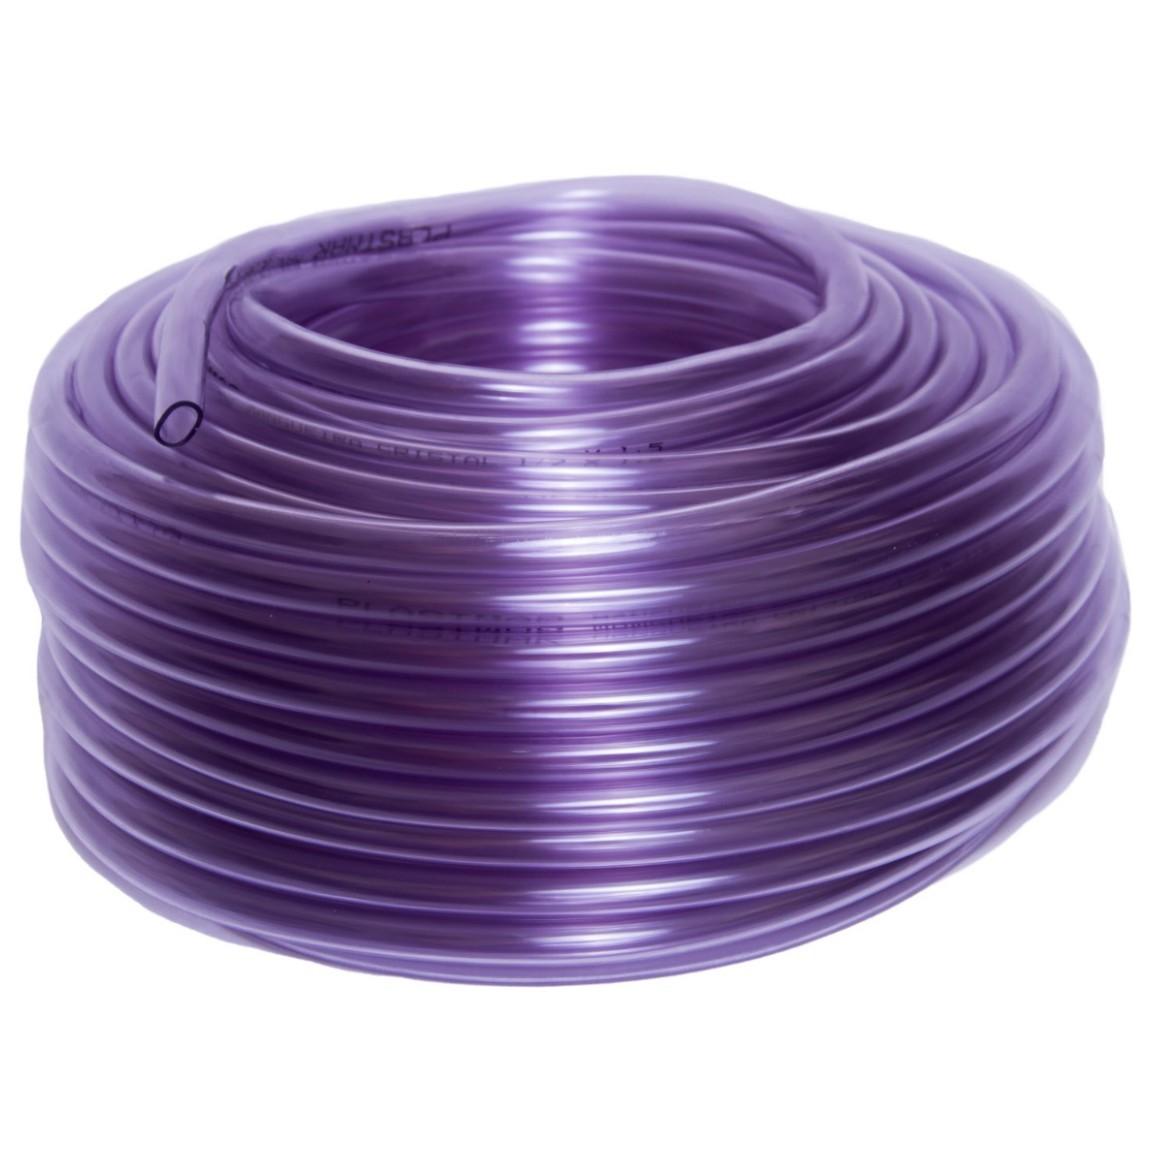 Mangueira de PVC 30m 1 Roxa 1824 - Plastmar